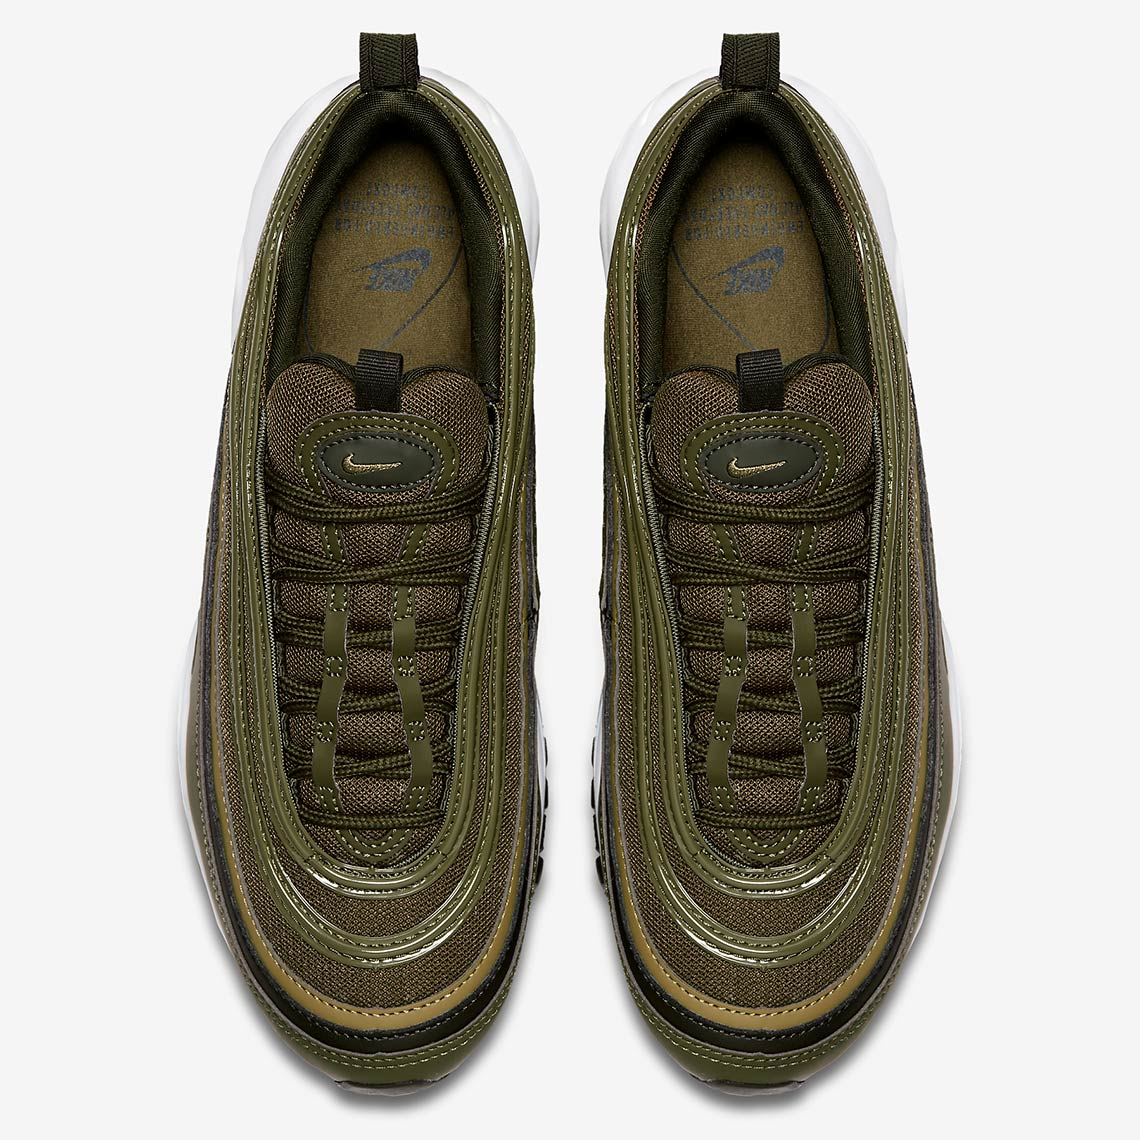 3a72e5f0e6 Nike Air Max 97 Olive Green 921773-200 Release Info | SneakerNews.com